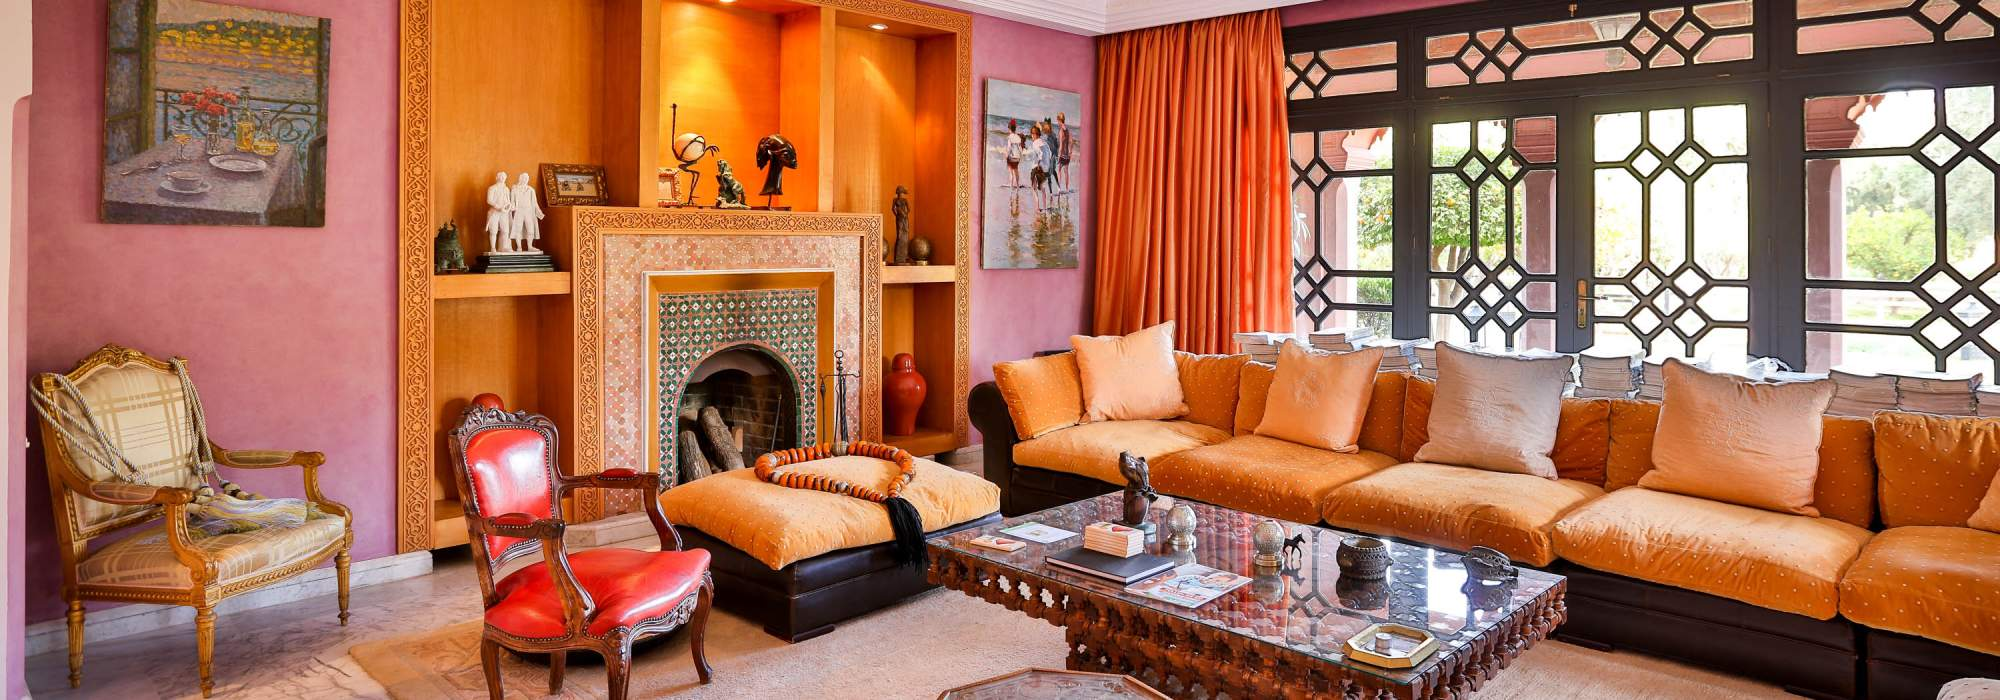 vente palais palmeraie marrakech